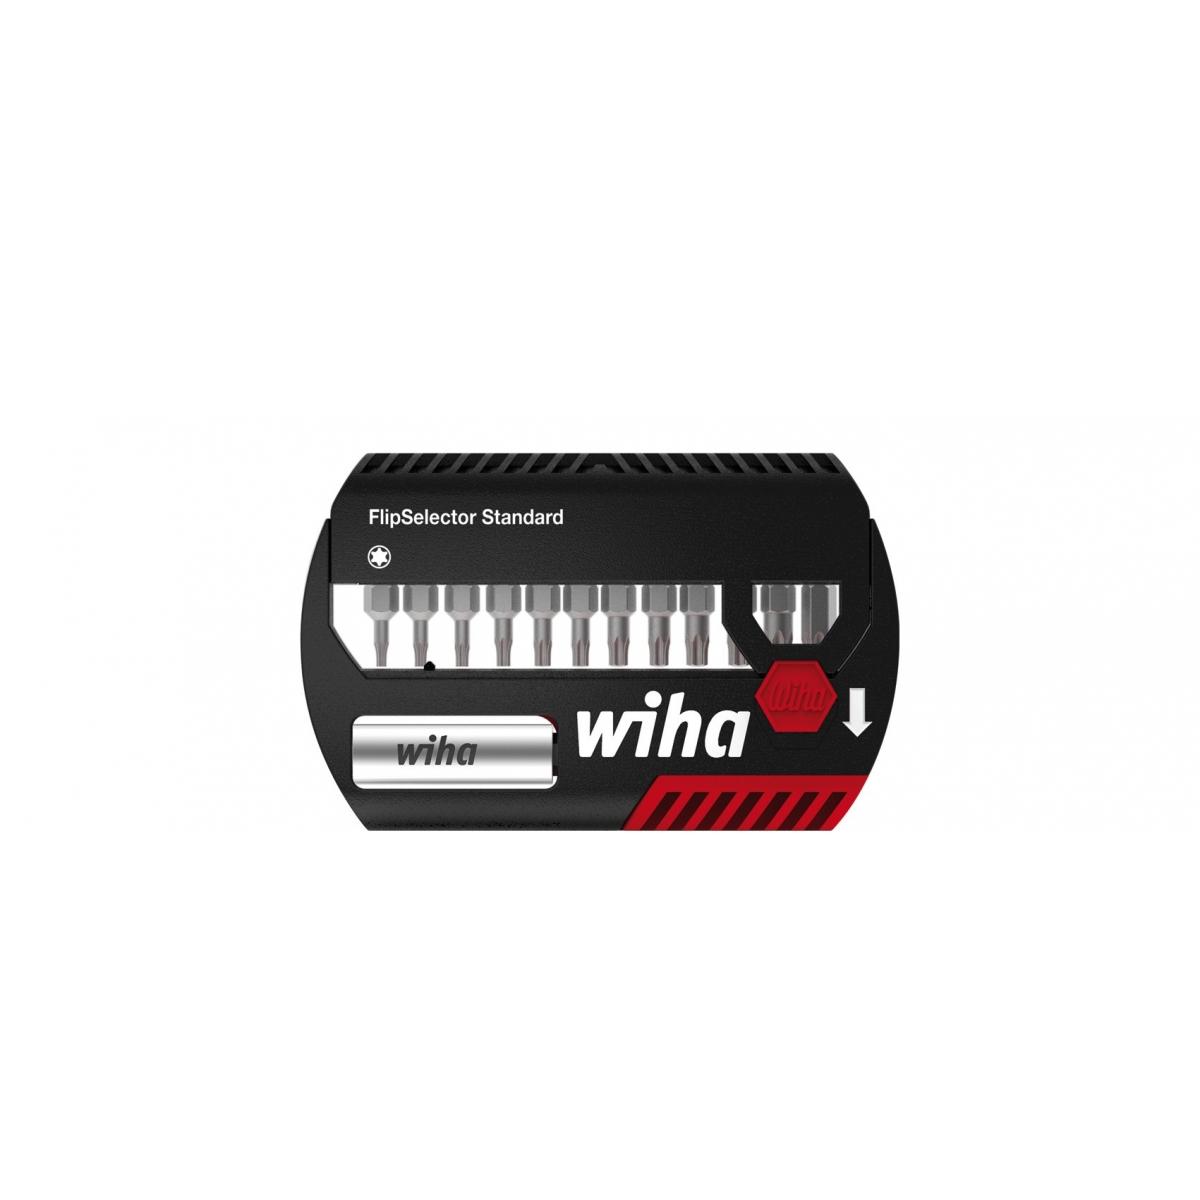 Zestaw bitów FlipSelector Standard 25 mm Wiha - 39124 Zestaw bitów FlipSelector Standard 25 mm Wiha - 39124